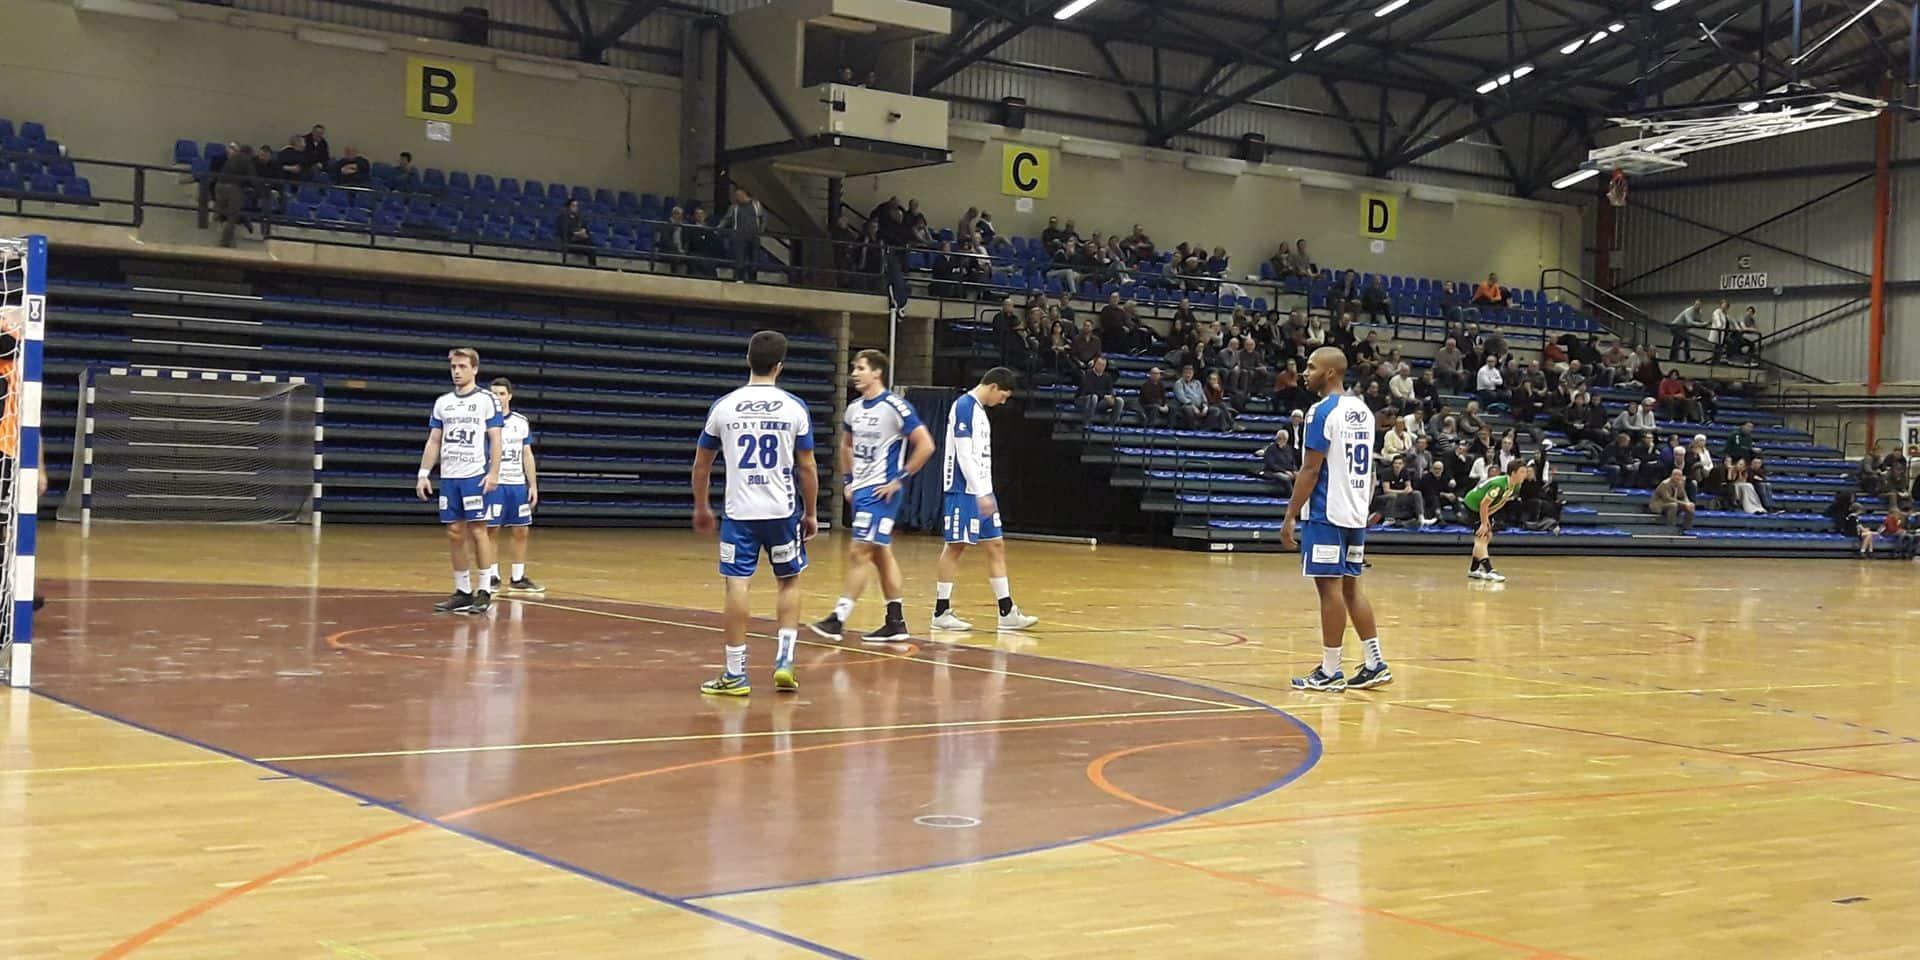 Handball: Visé franchit l'écueil de Hasselt